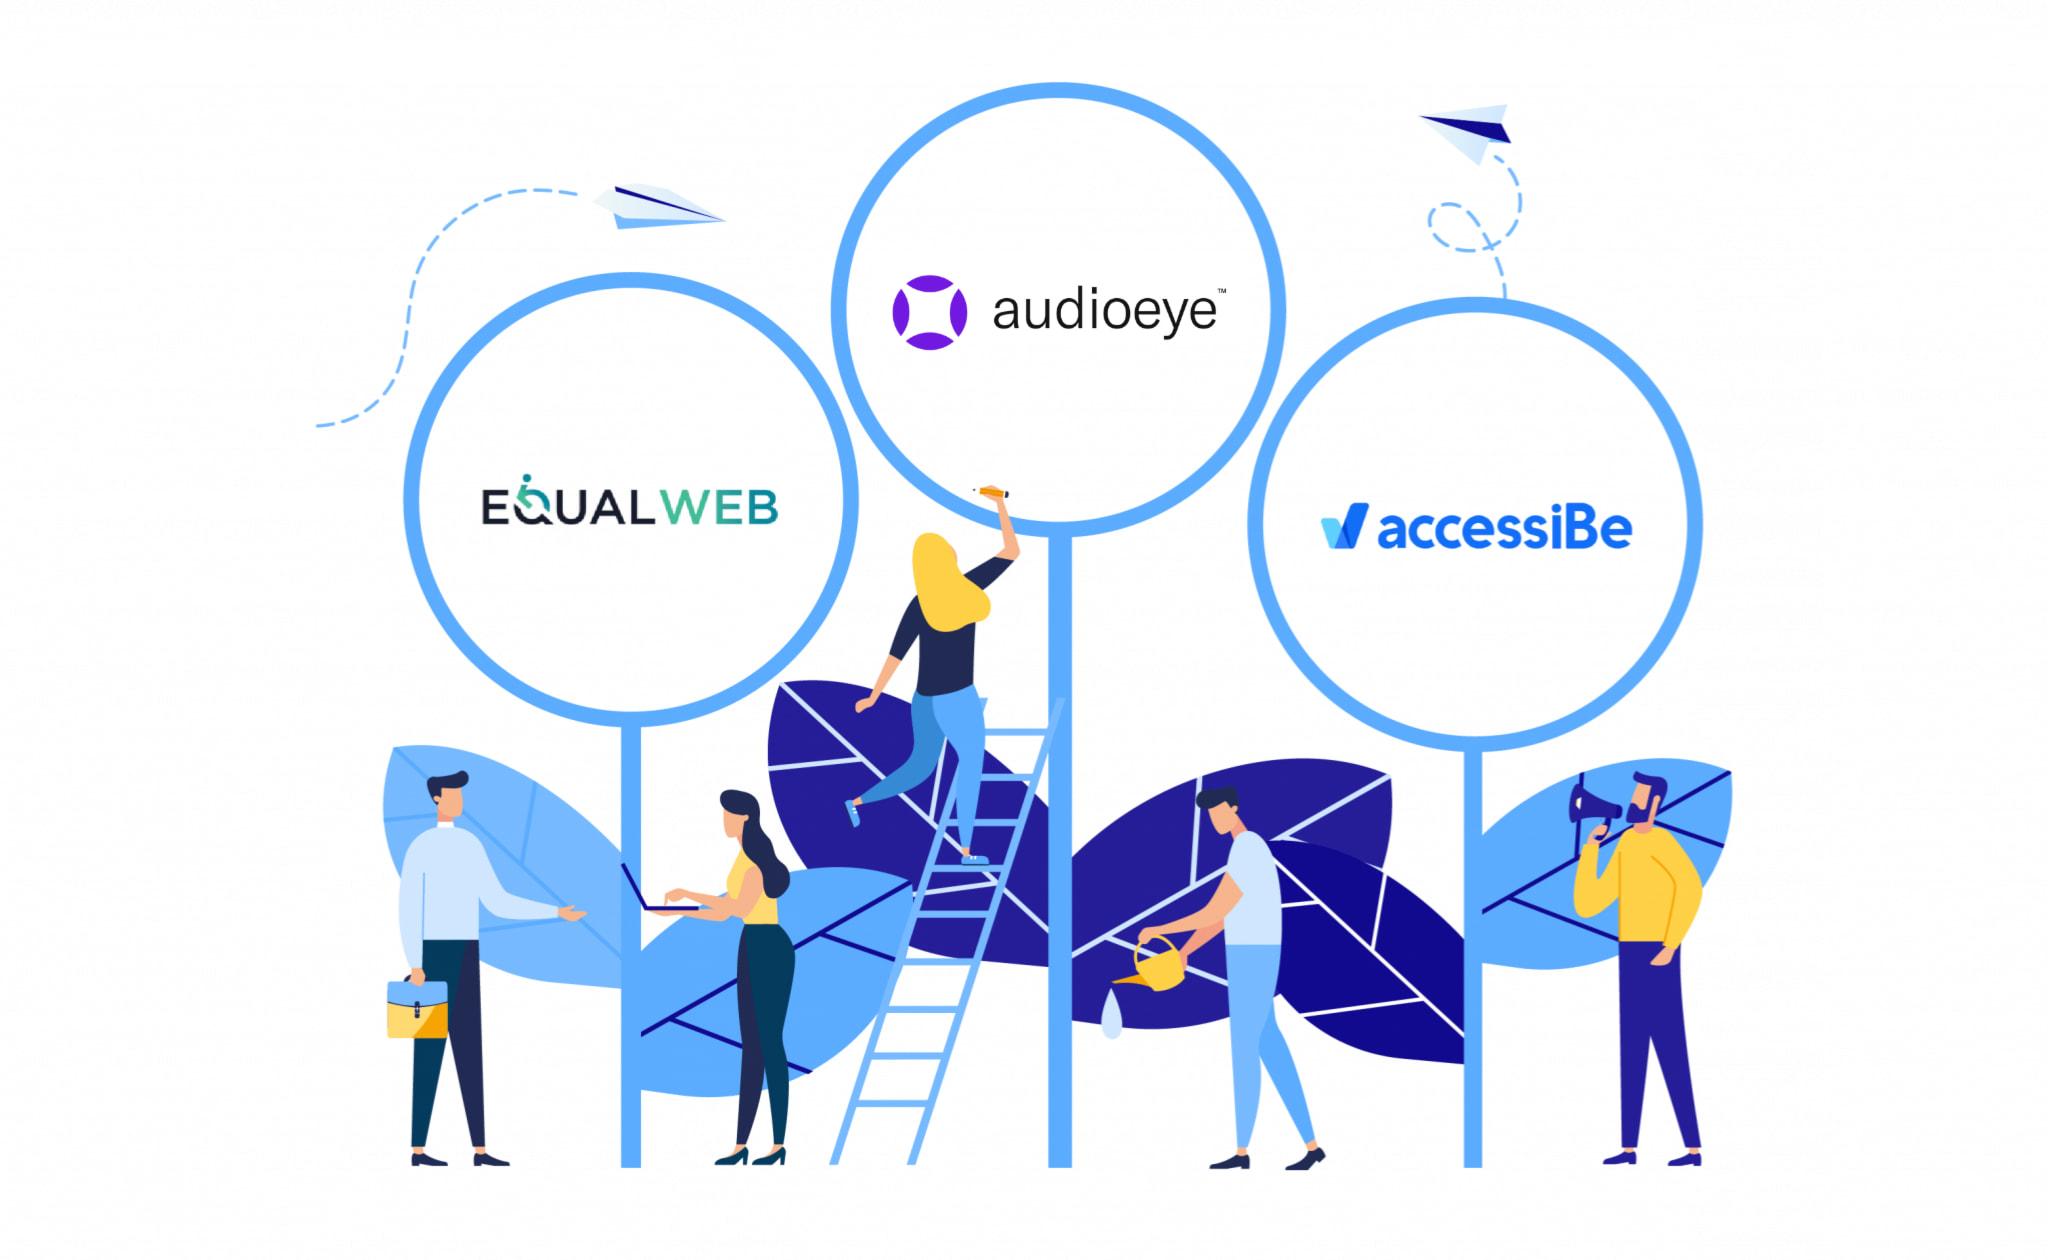 EqualWeb AudioEye AccessiBe